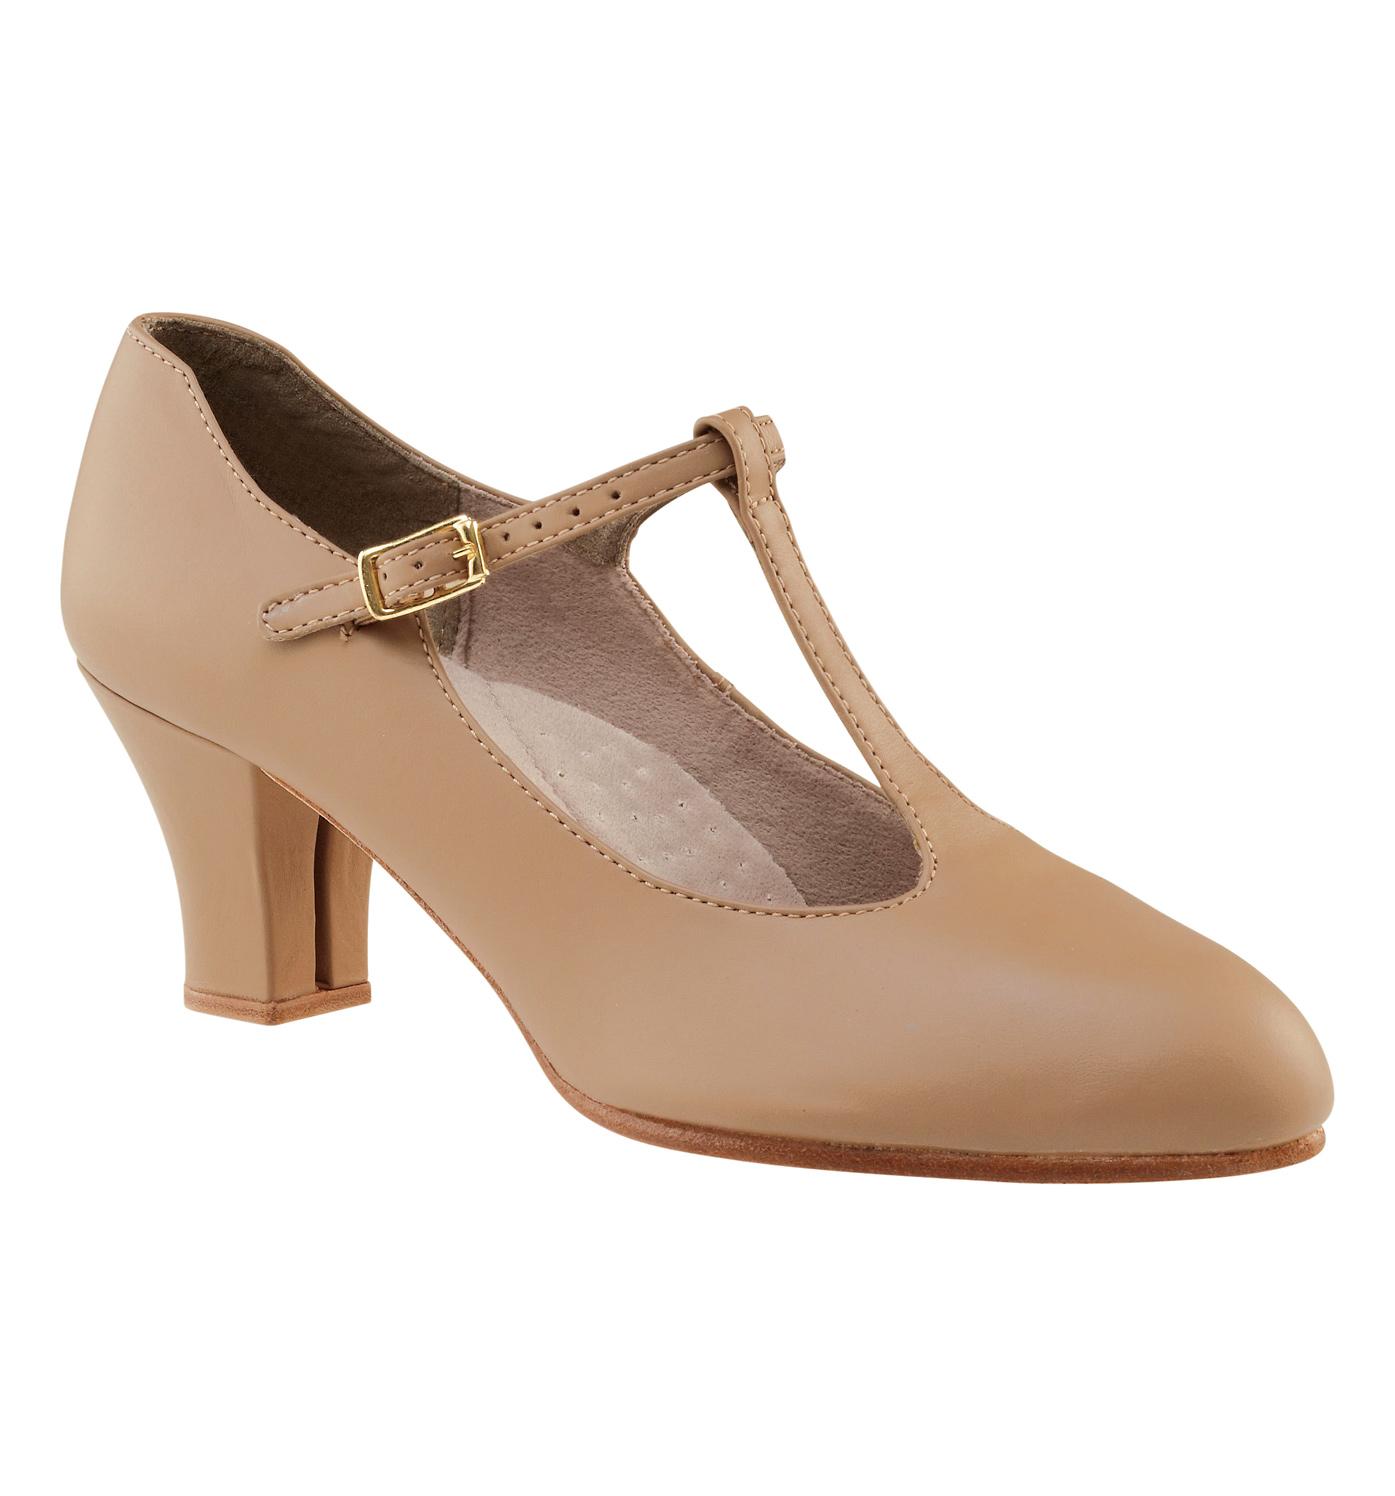 Laduca Shoes Price